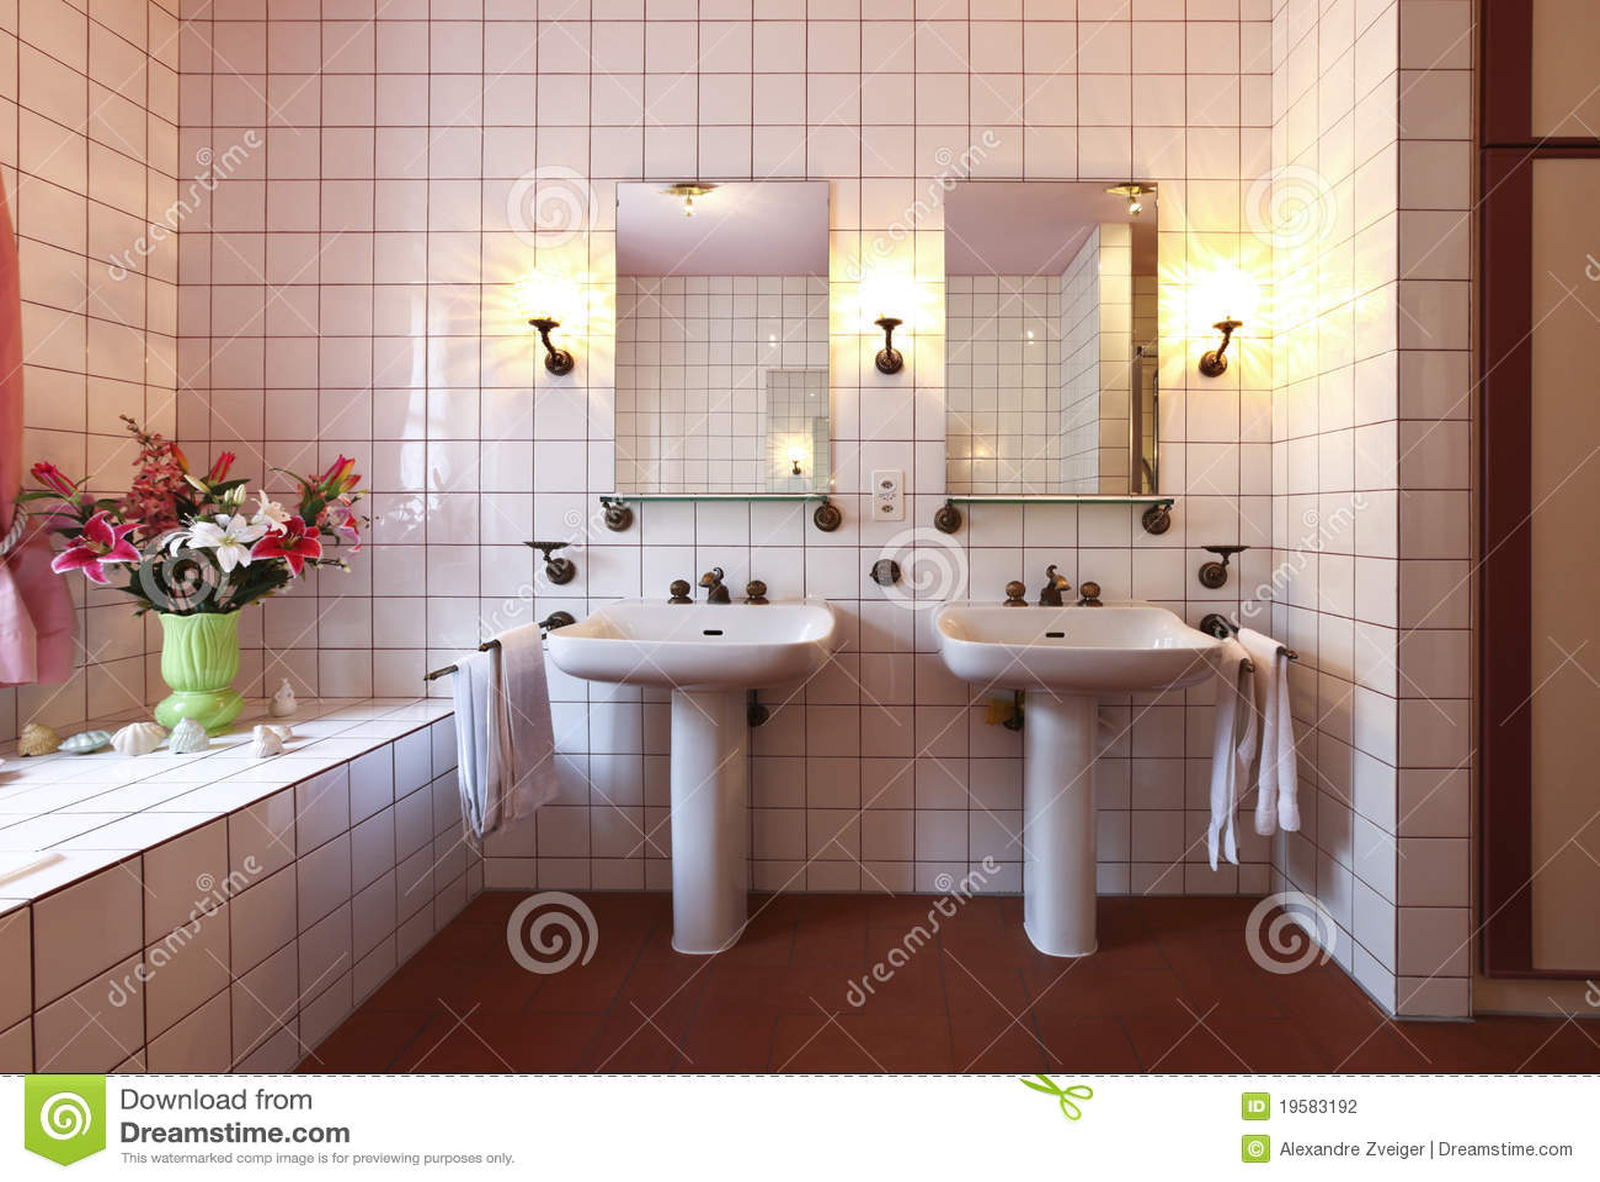 Mooie badkamers in klassieke stijl stock fotografie afbeelding 19583192 - Mooie badkamers ...